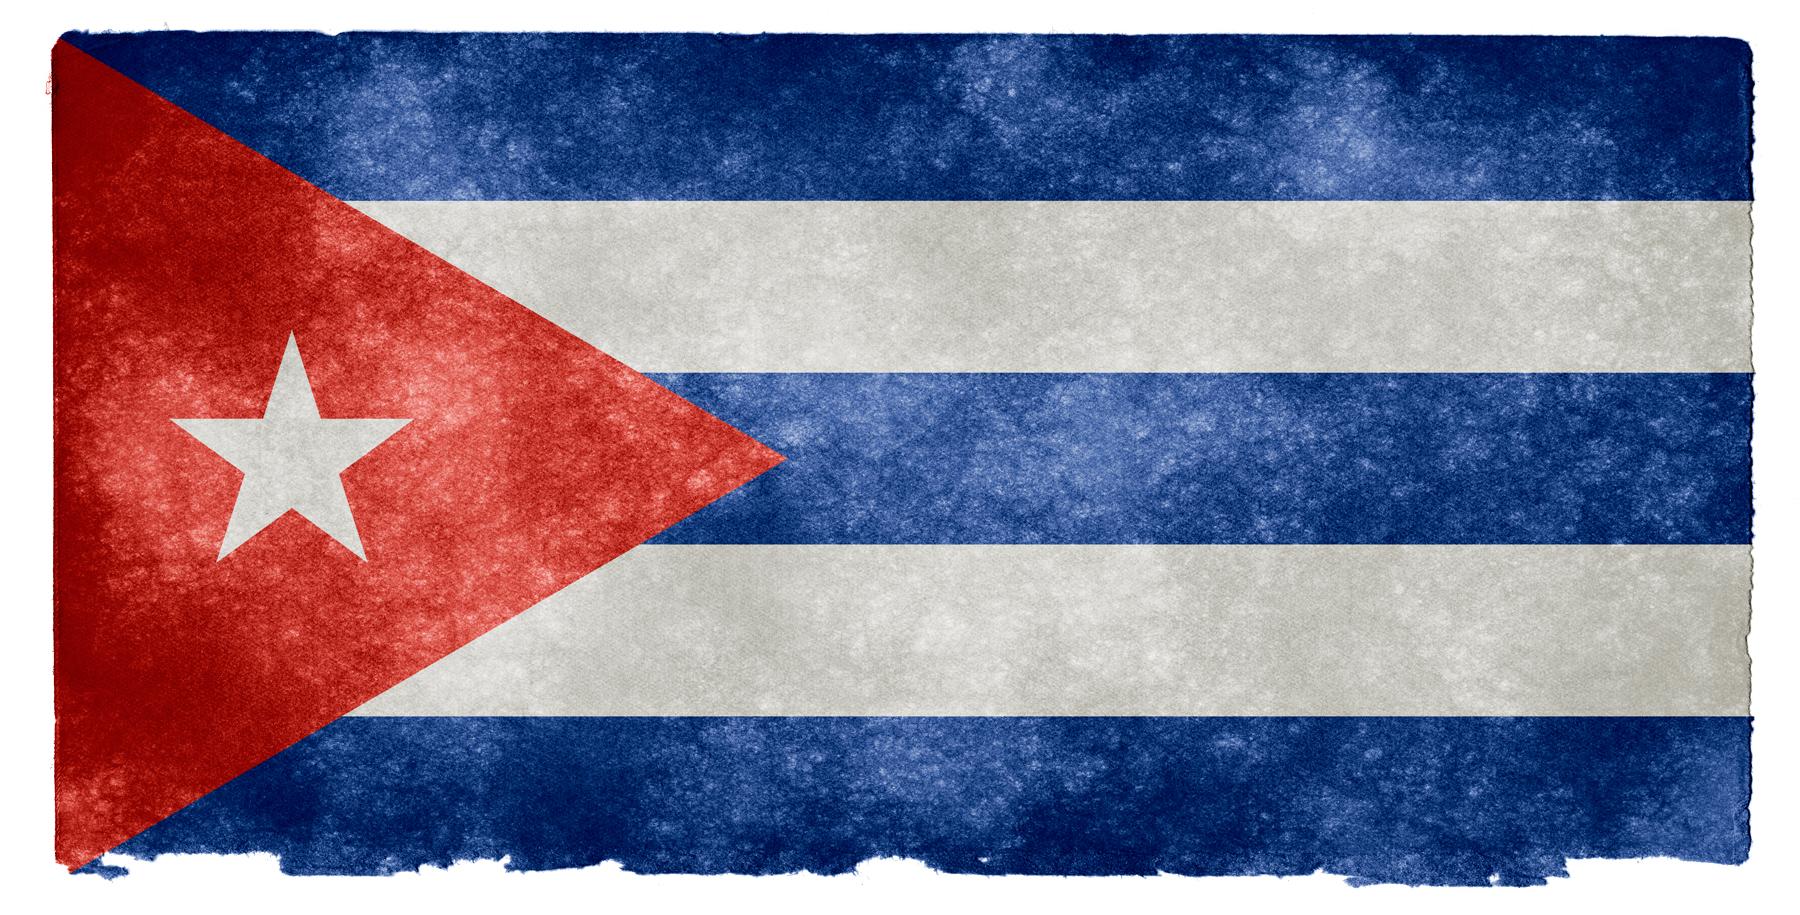 Cuba Grunge Flag, Aged, Retro, National, Old, HQ Photo